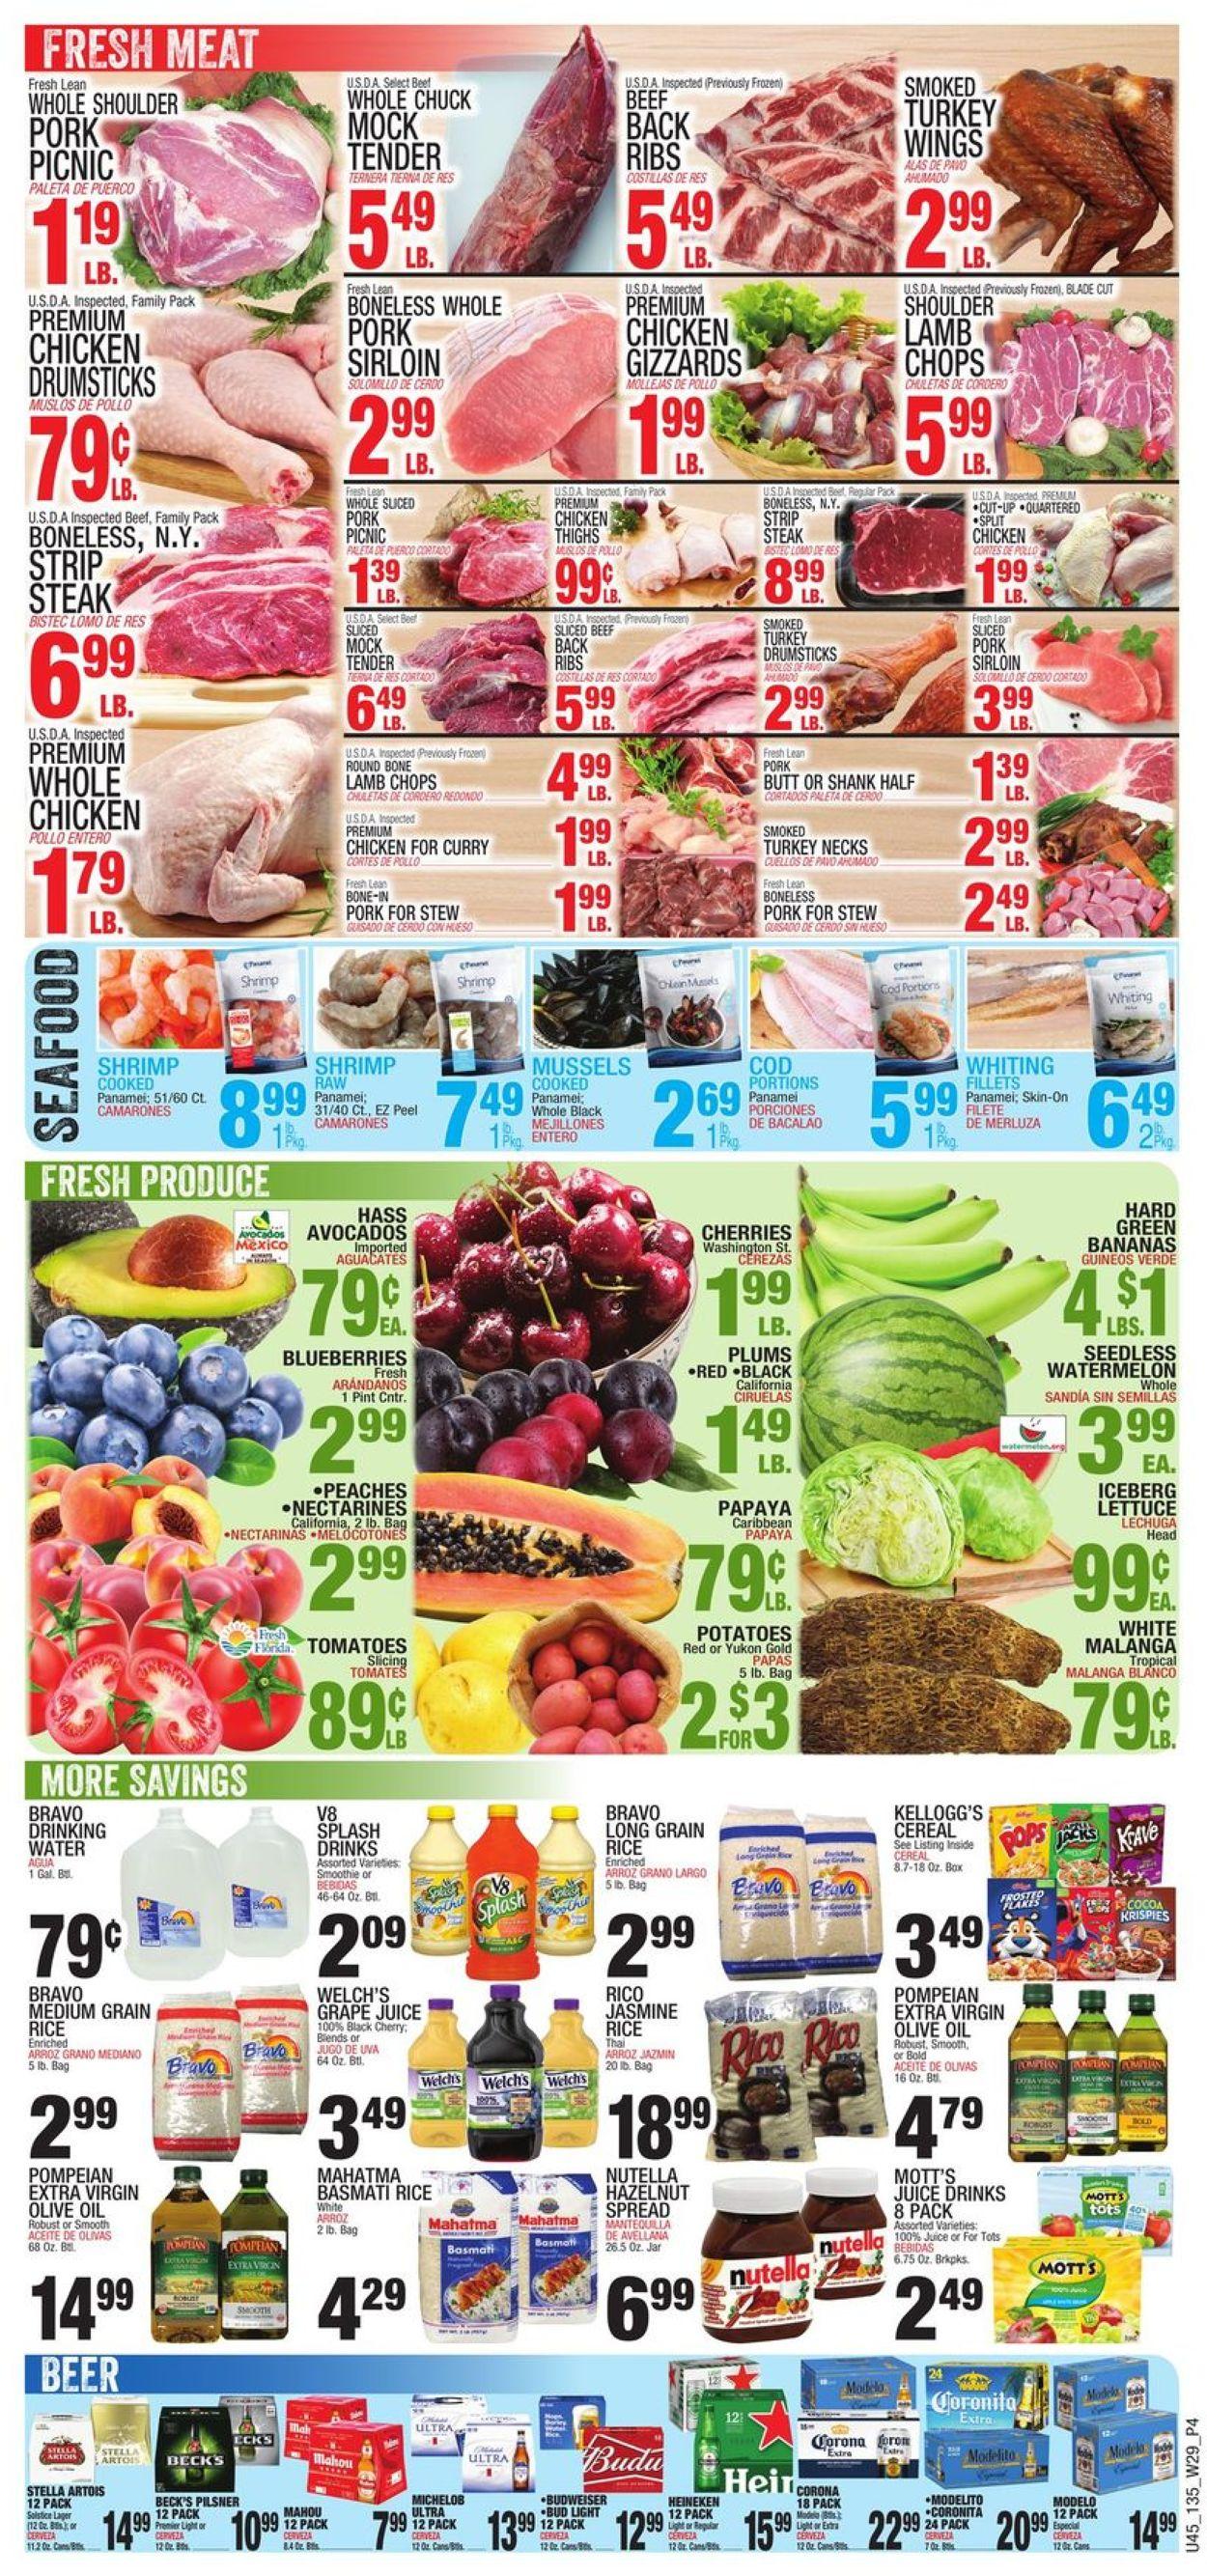 Bravo Supermarkets Weekly Ad Circular - valid 07/15-07/21/2021 (Page 4)